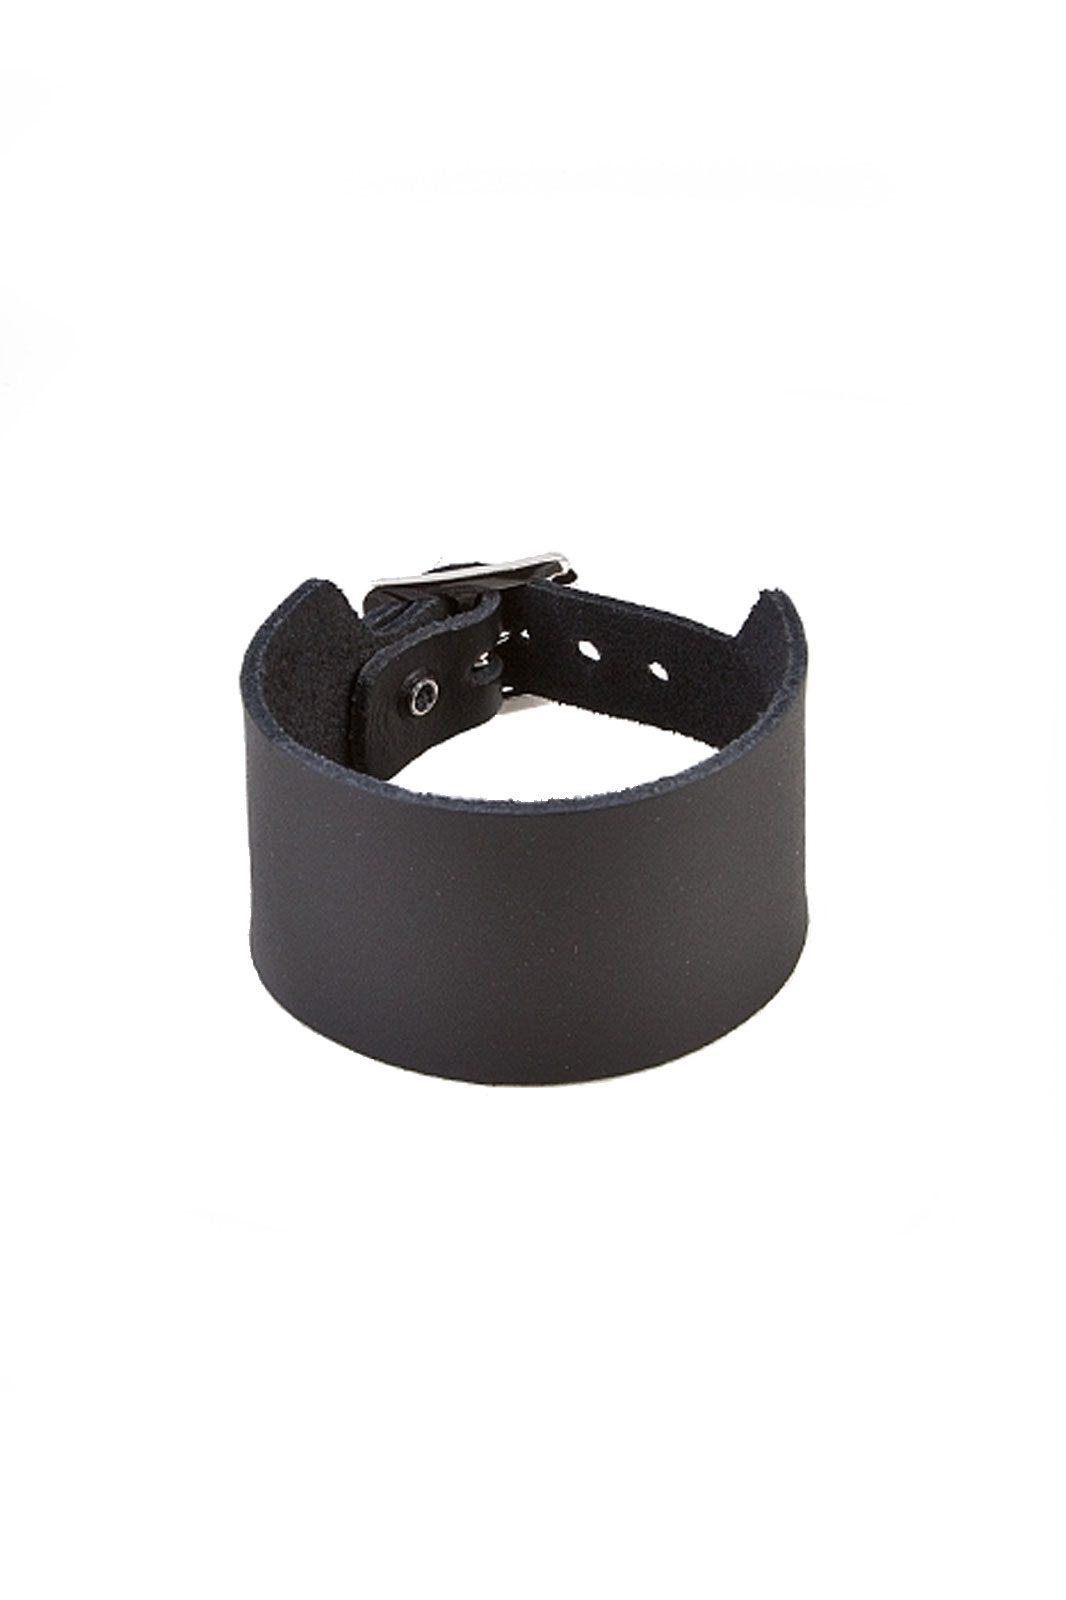 randomizer 2 row plain leather wristband black